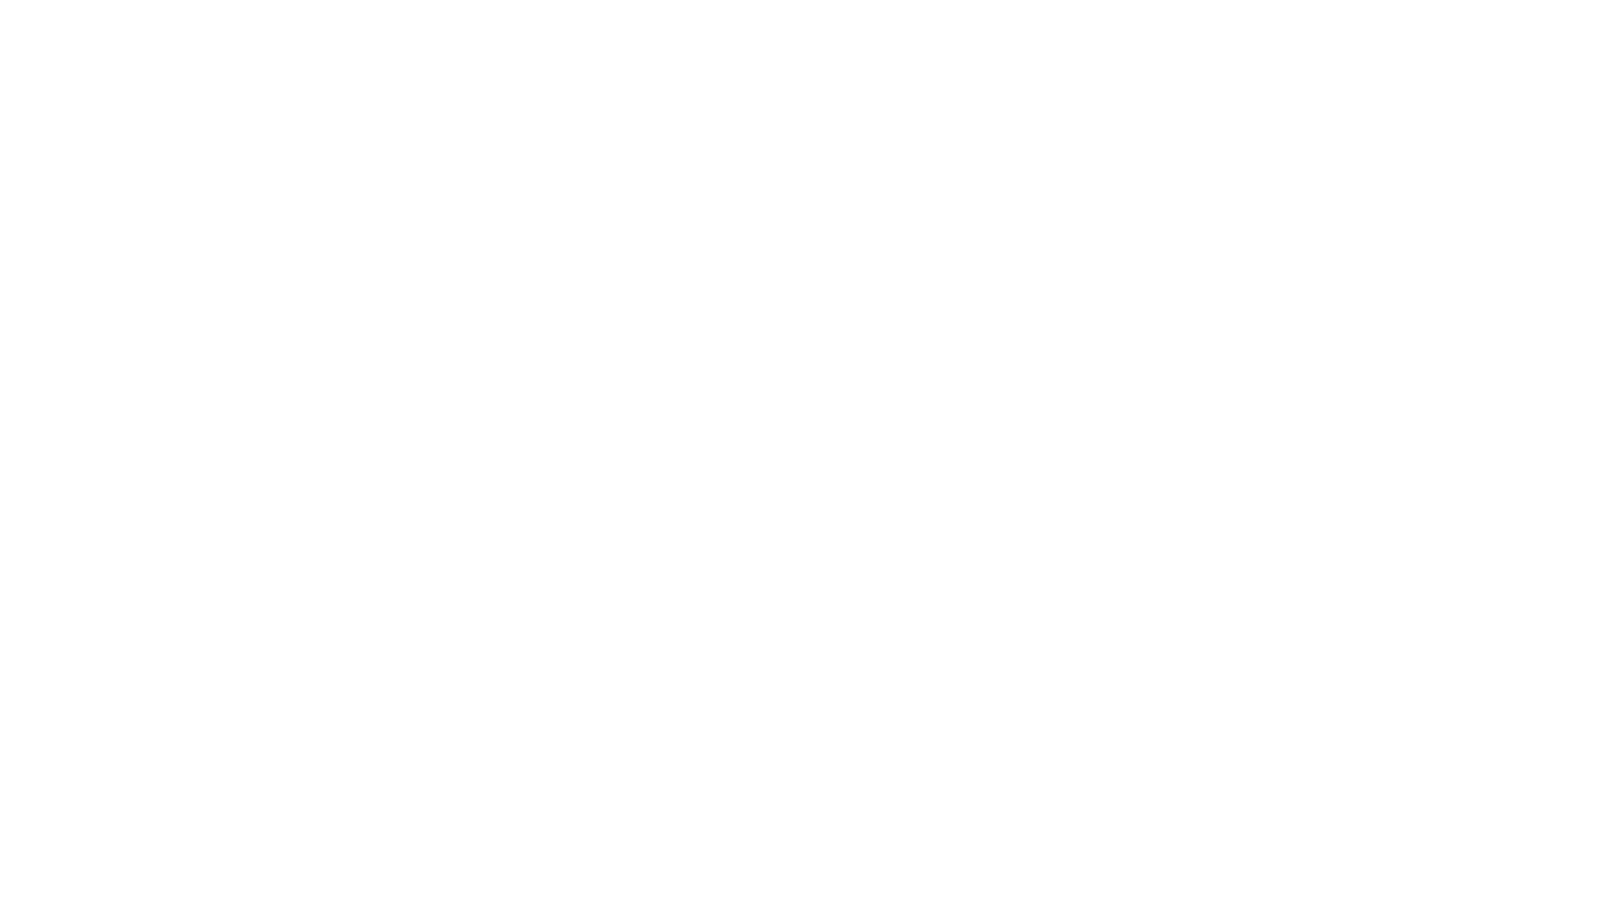 Sekolah Damai, Jakarta Barat TK - SD - SMP - SMA  Bahasa Indonesia - IKLAN - Kelas 5 oleh Miss Christine ketuk tombol like, komentar, dan subscribe #tkdamai #sddamai #smpdamai #smadamai #pembelajaranjarakjauh #sekolahdamai #sdkatolik #sekolahkatolik #ybhk www.damai.sch.id